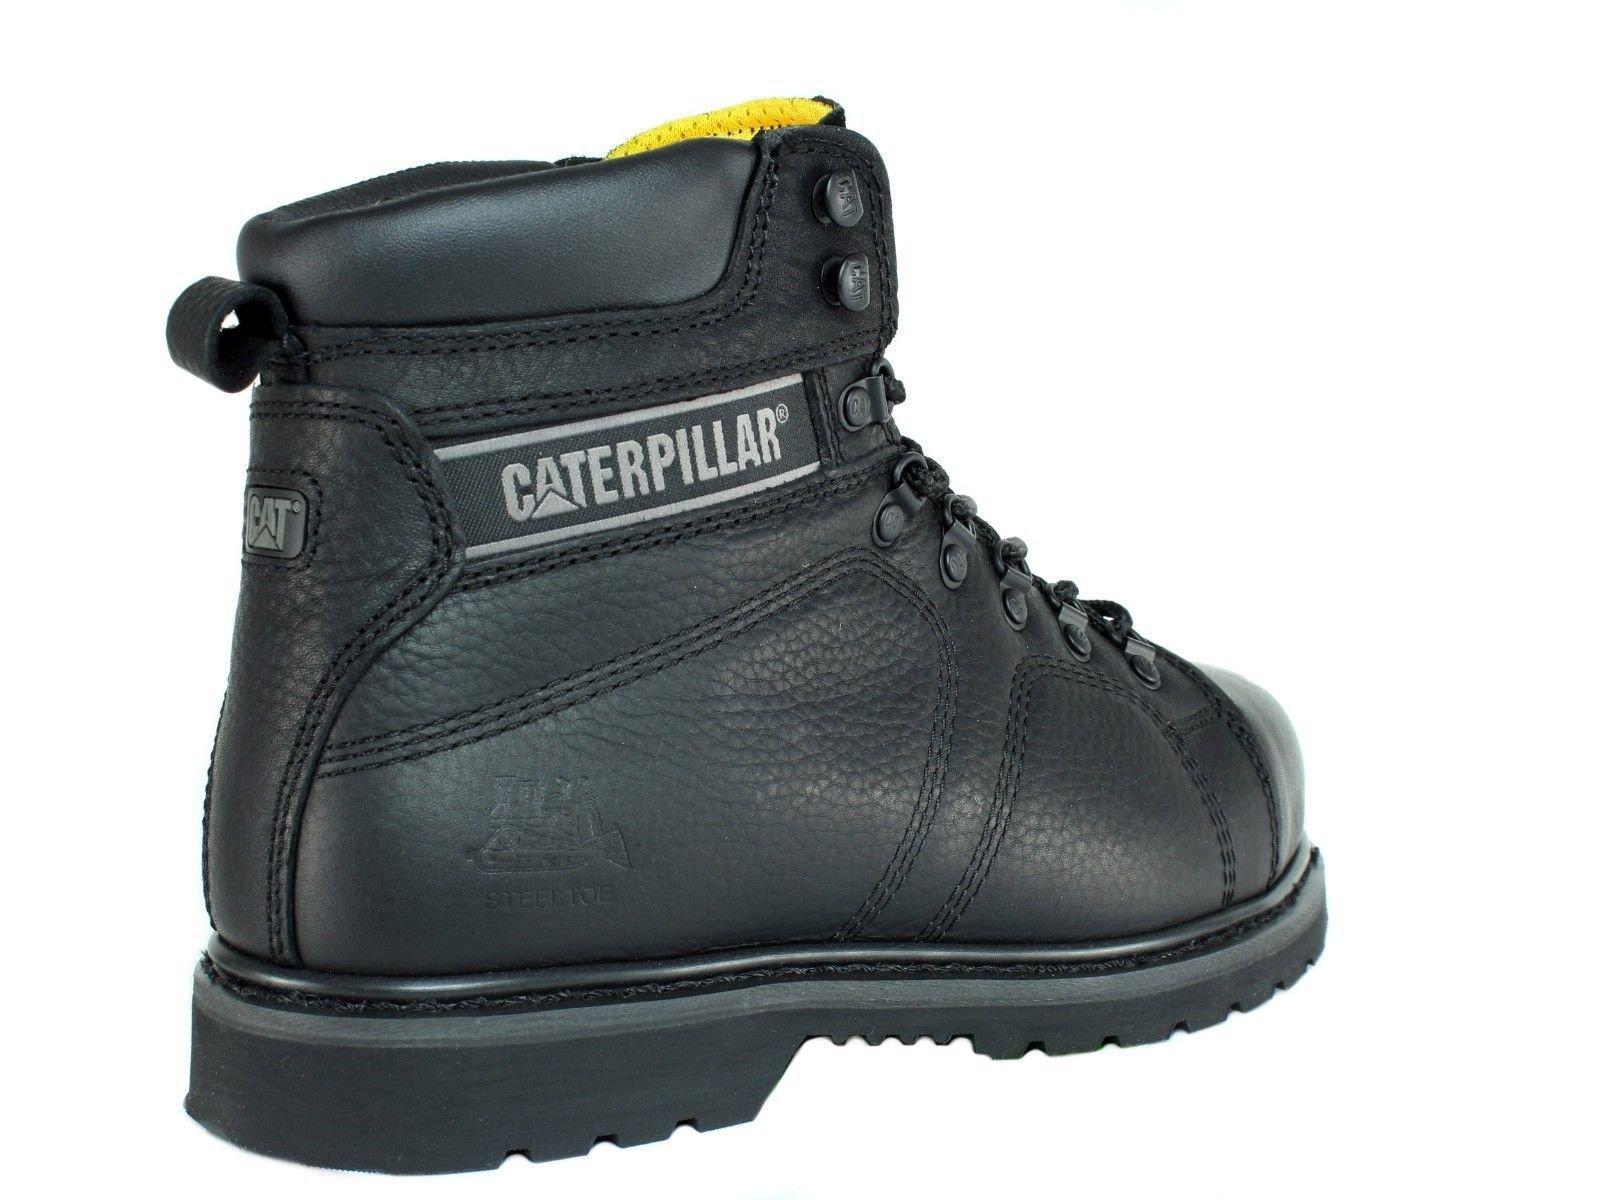 Caterpillar SureGrip Mens Silverton SG Black Slip Resistant Work Boots 12M by Caterpillar (Image #3)